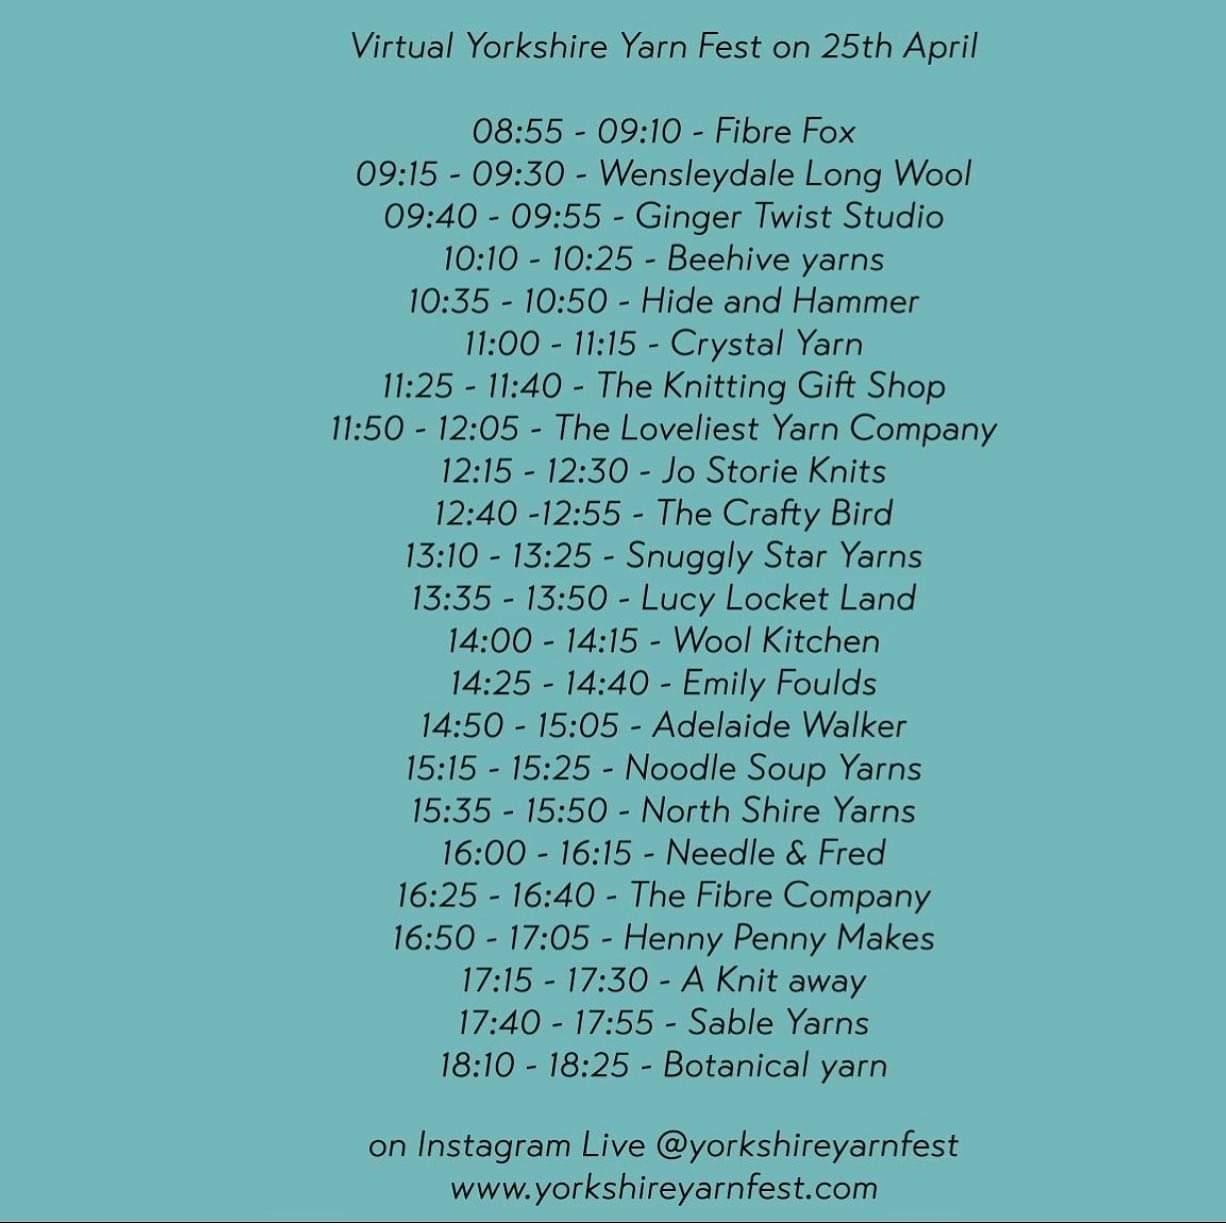 Virtual Yorkshire Yarn Fest - April 2020 schedule